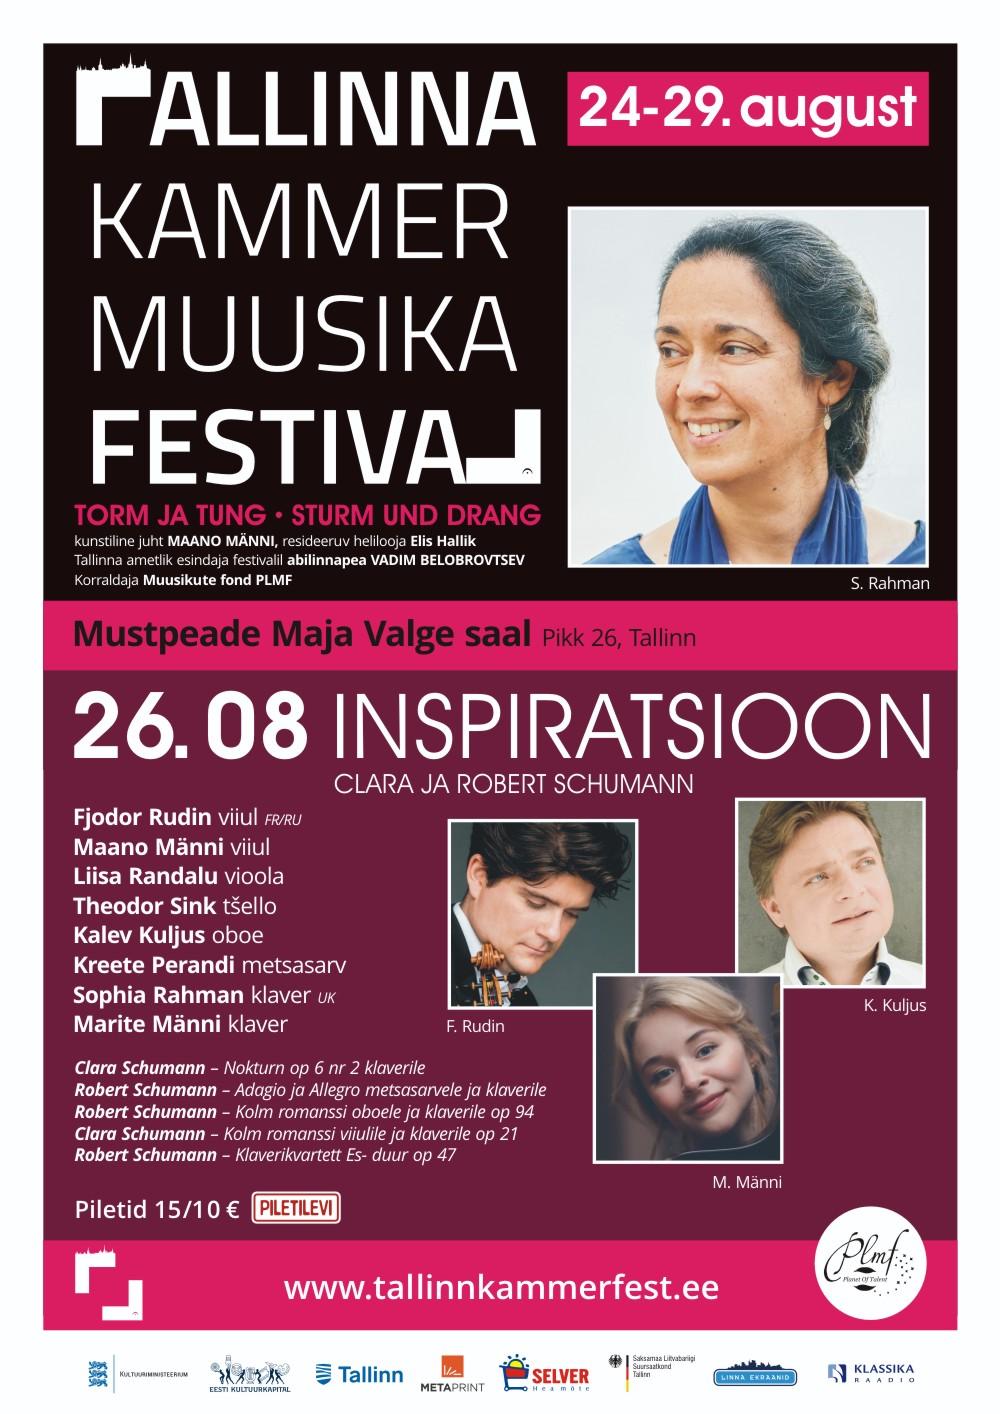 Inspiratsioon. Sophia Rahman & Fjodor Rudin / Tallinna Kammermuusika Festival